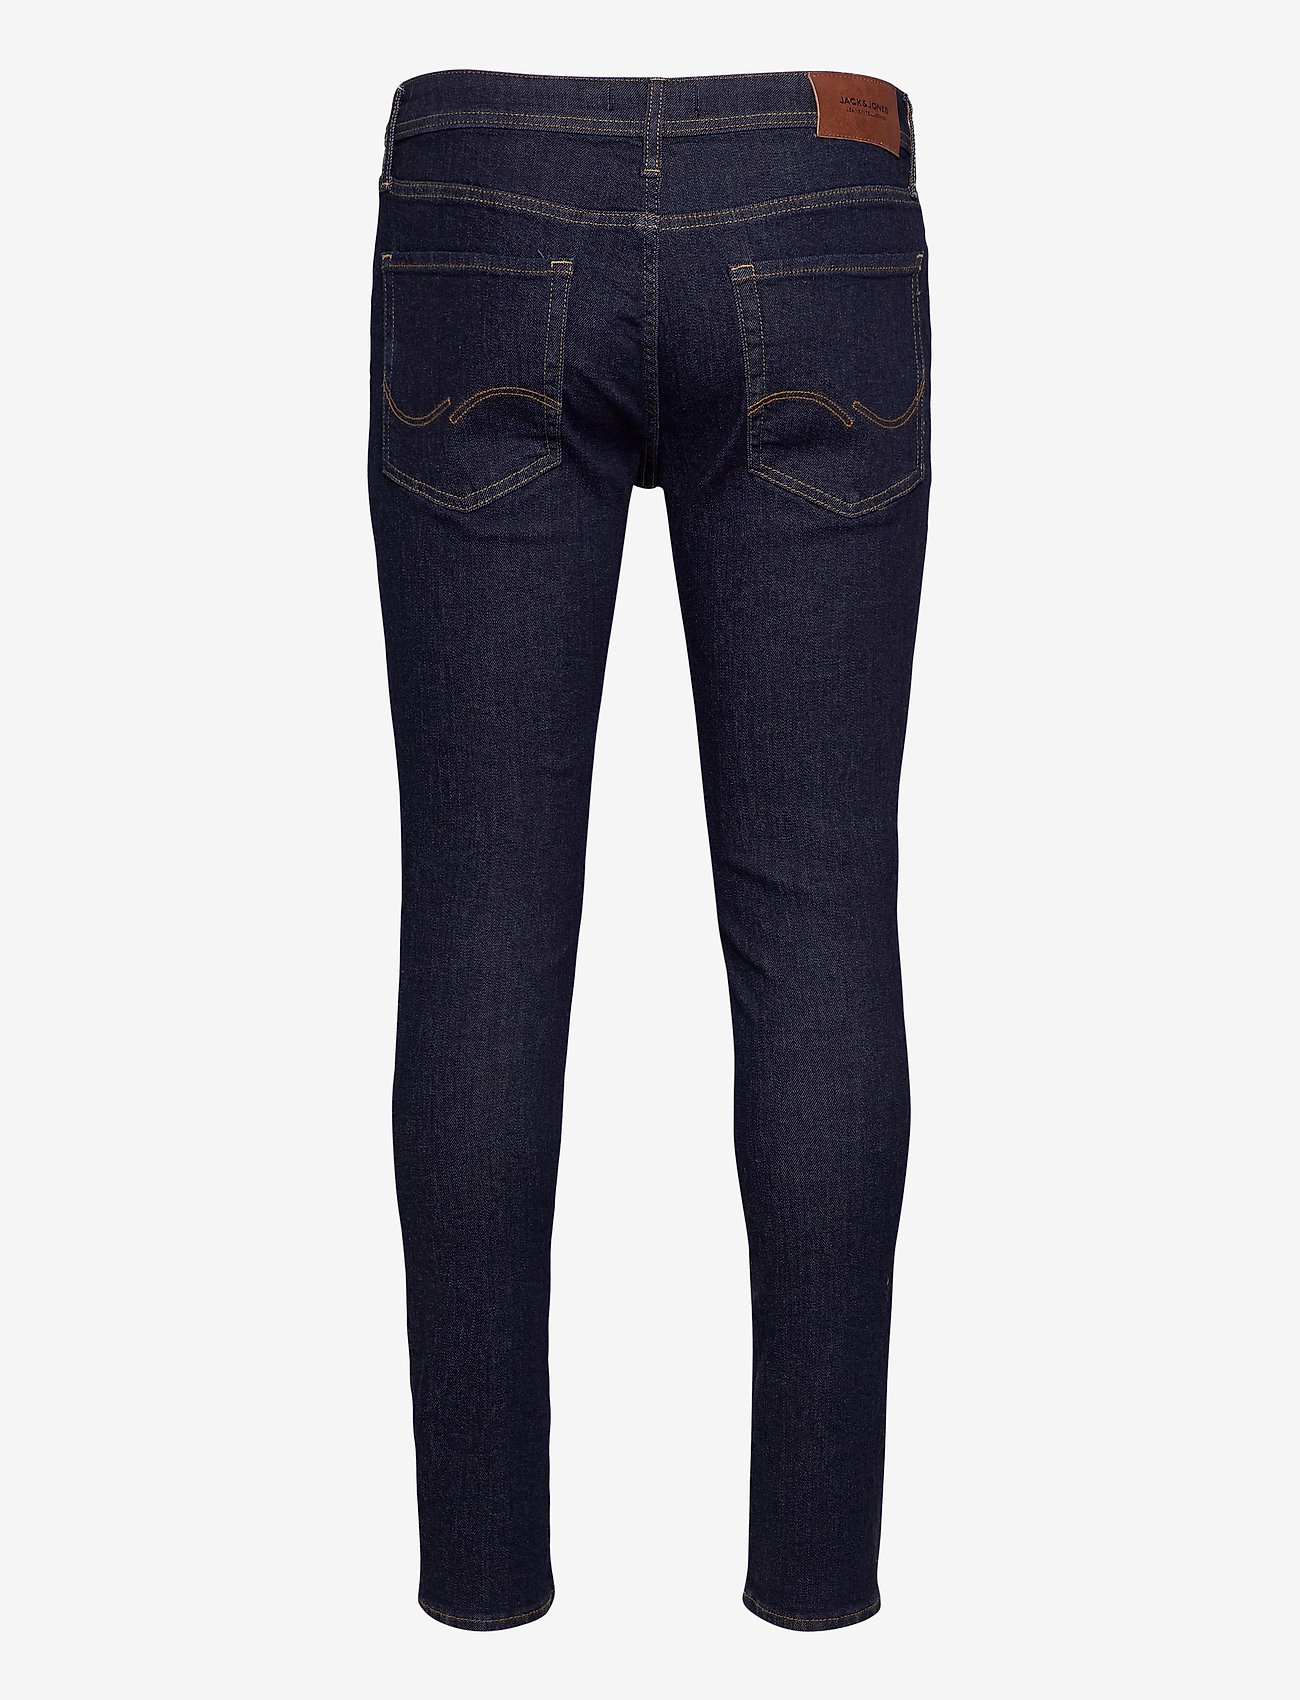 Jack & Jones - JJILIAM JJORIGINAL AGI 074 - slim jeans - blue denim - 1